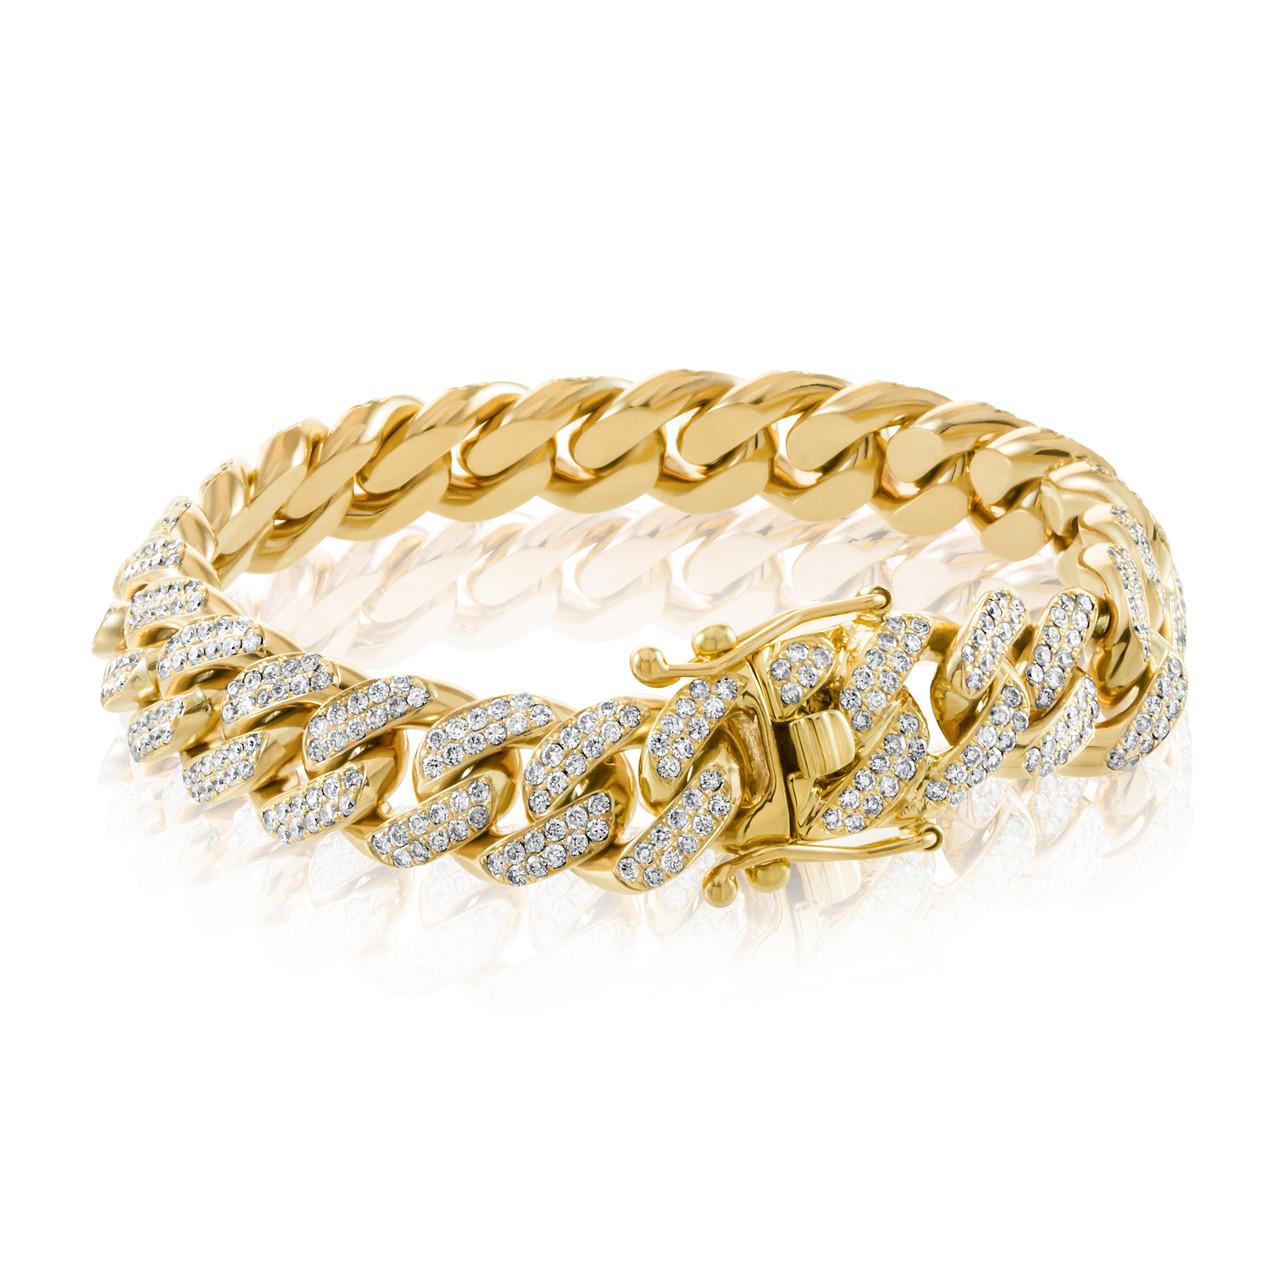 4dbb09c746e56 10k Yellow Gold 16ct Diamond Cuban Link Bracelet